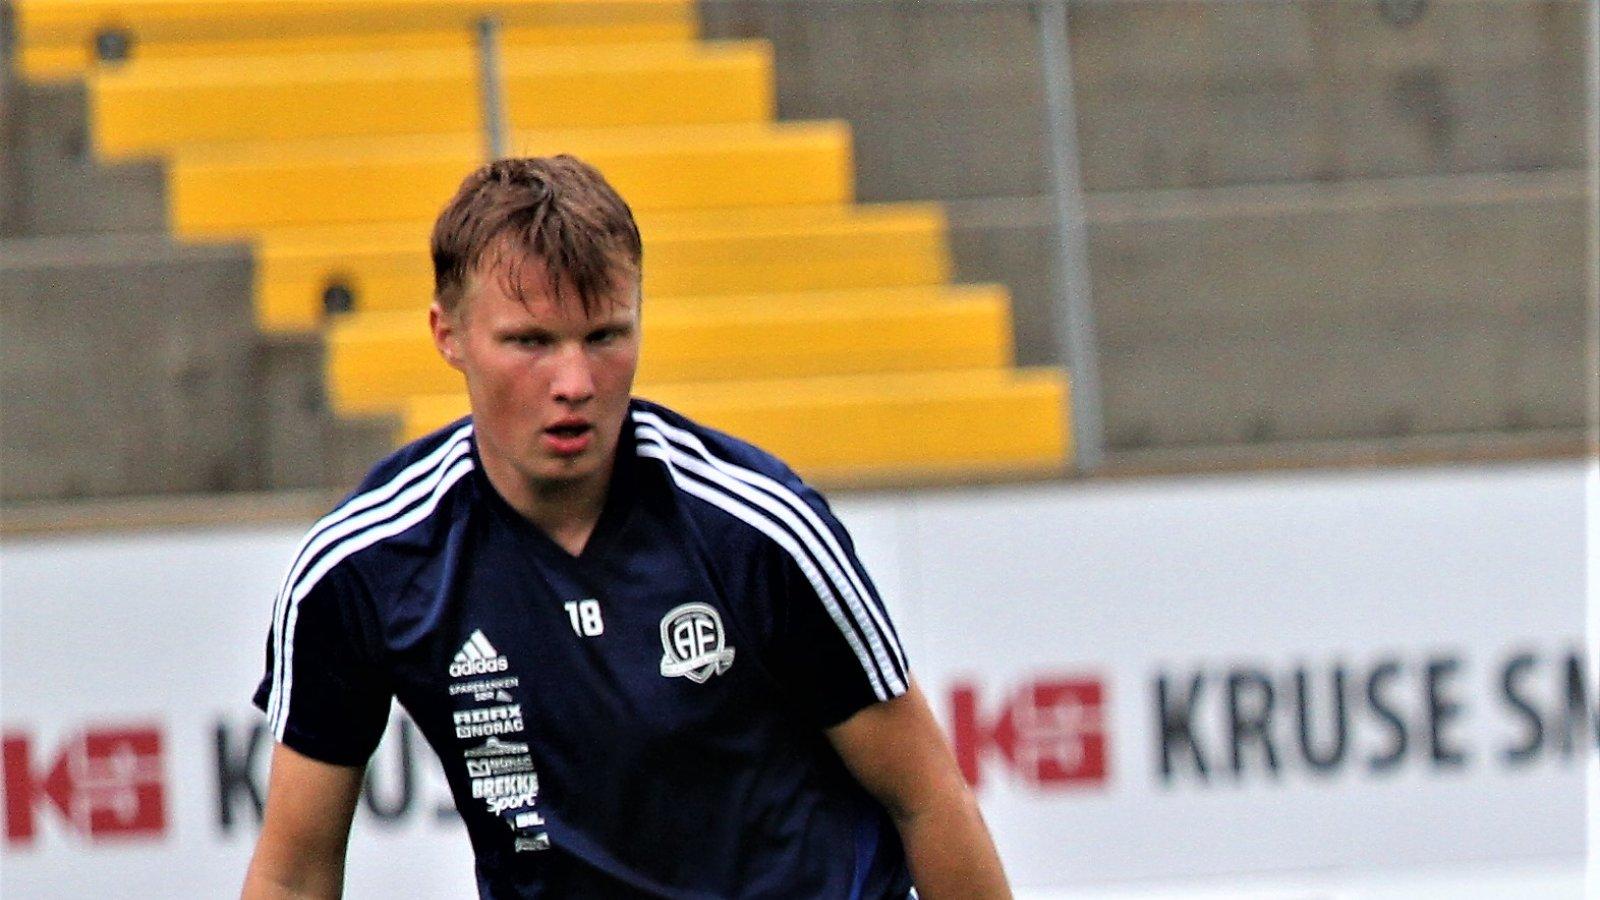 Markus Håbestad